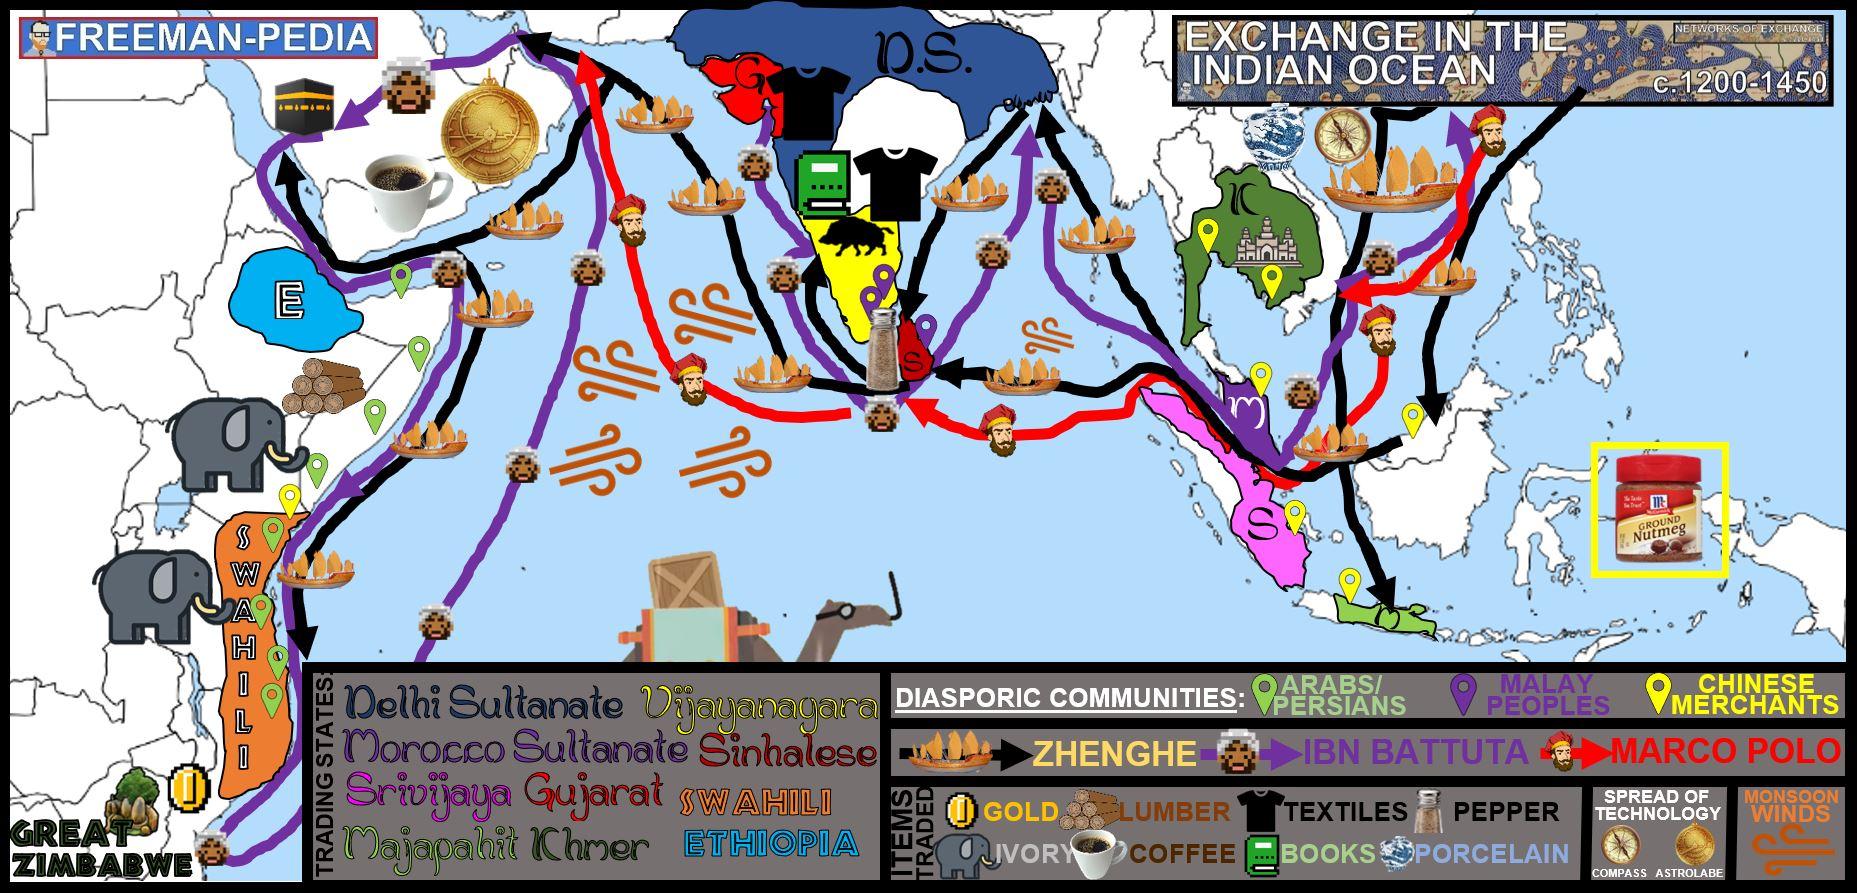 2.3 INDIAN OCEAN TRADE NETWORKS OF EXCHANGE FREEMANPEDIA MAP AP WORLD MODERN 2019.JPG